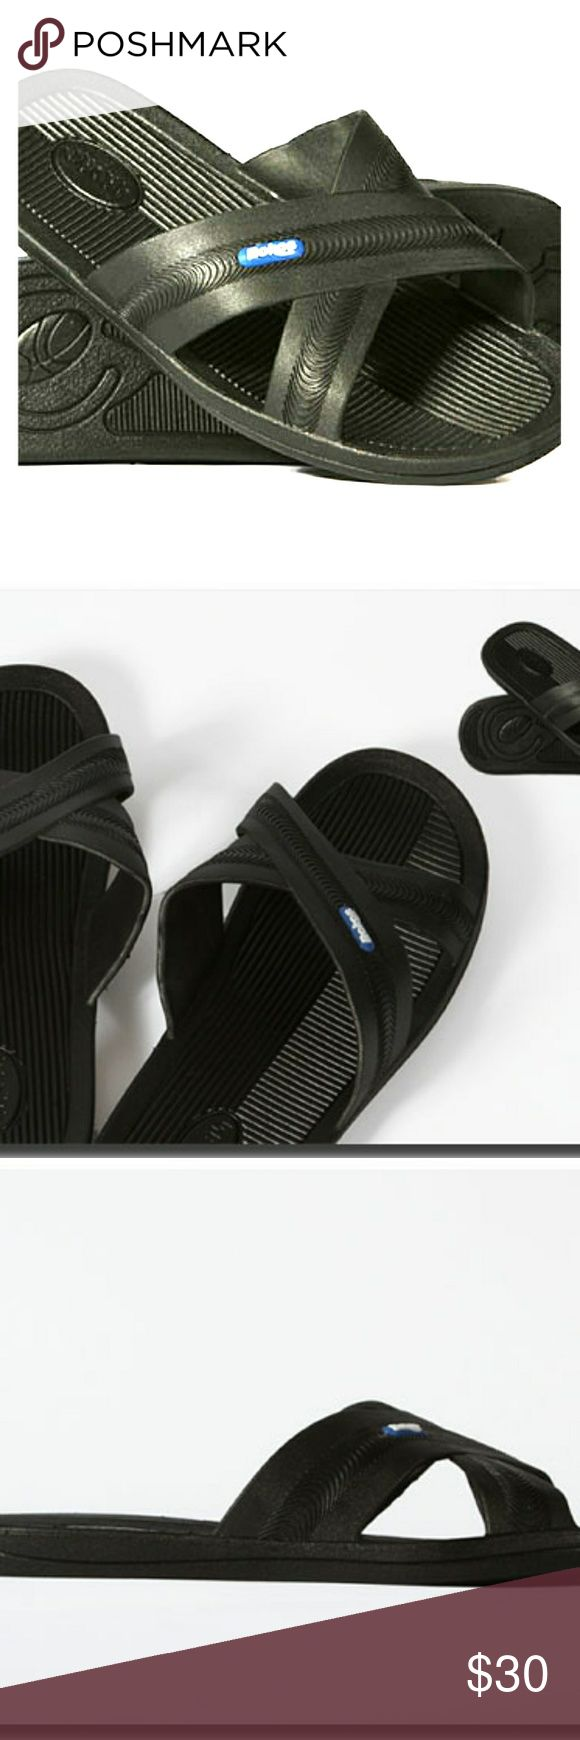 MENS BOKOS SLIDE SANDALS NWT Design as Shown New :) bokos Shoes Sandals & Flip-Flops